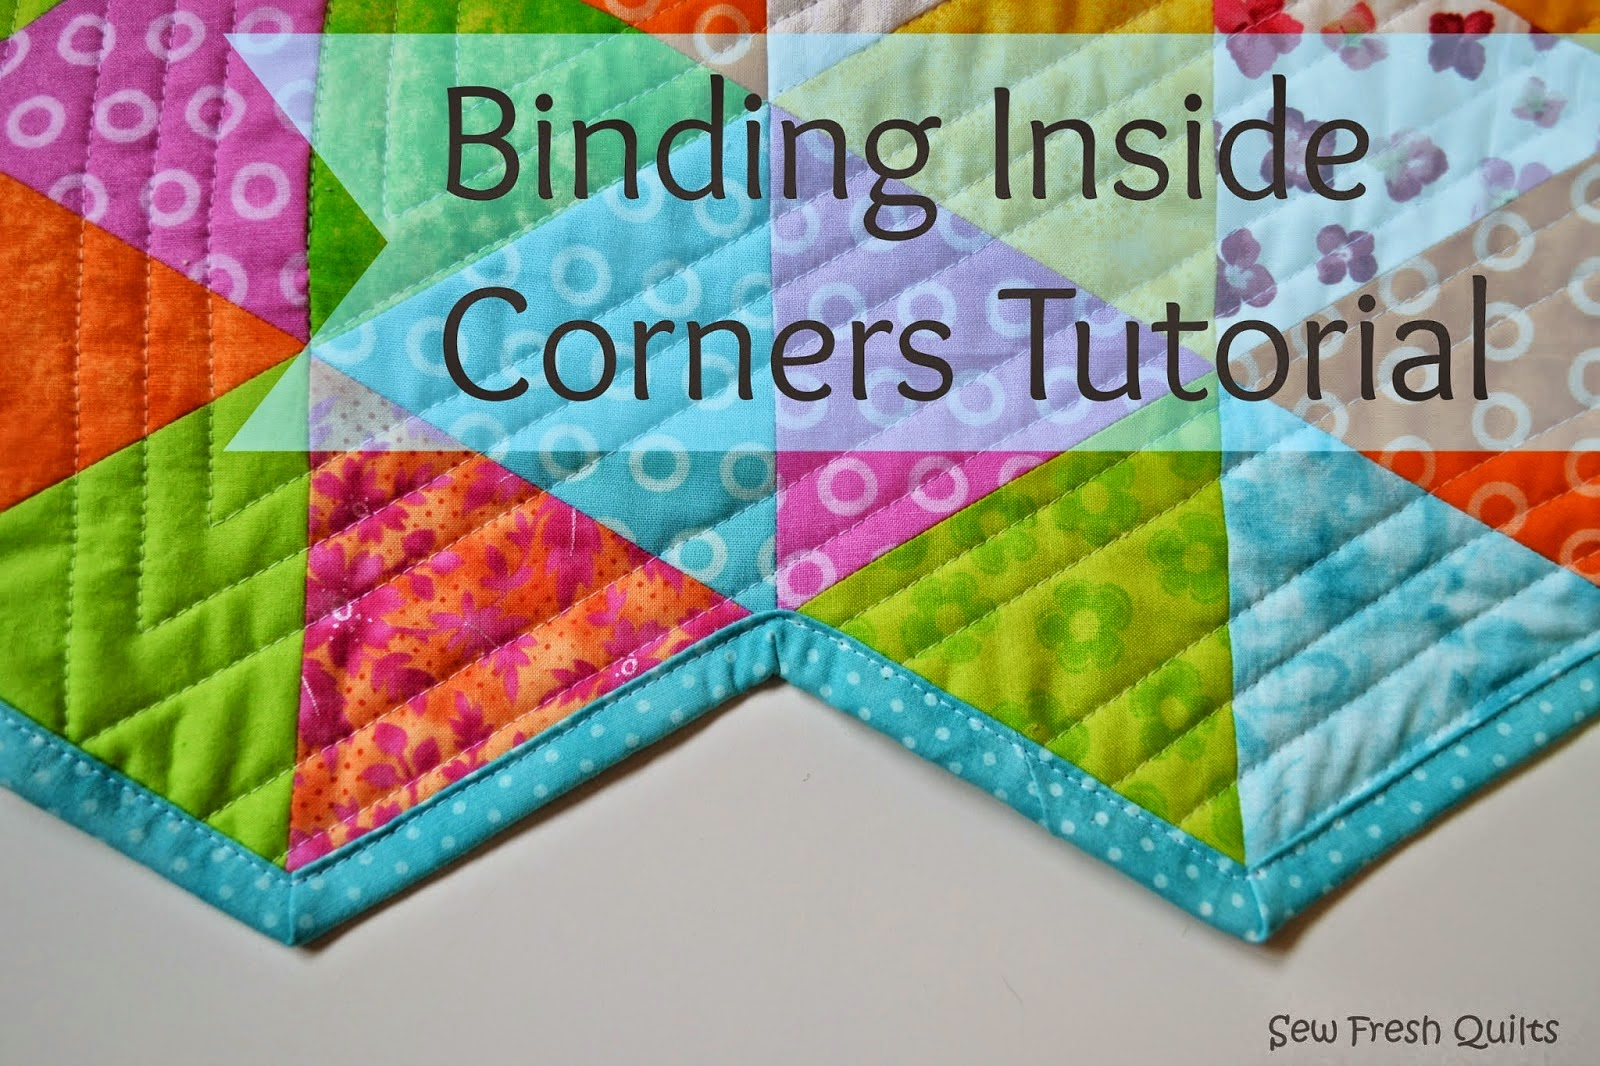 http://sewfreshquilts.blogspot.ca/2014/04/binding-inside-corners-tutorial